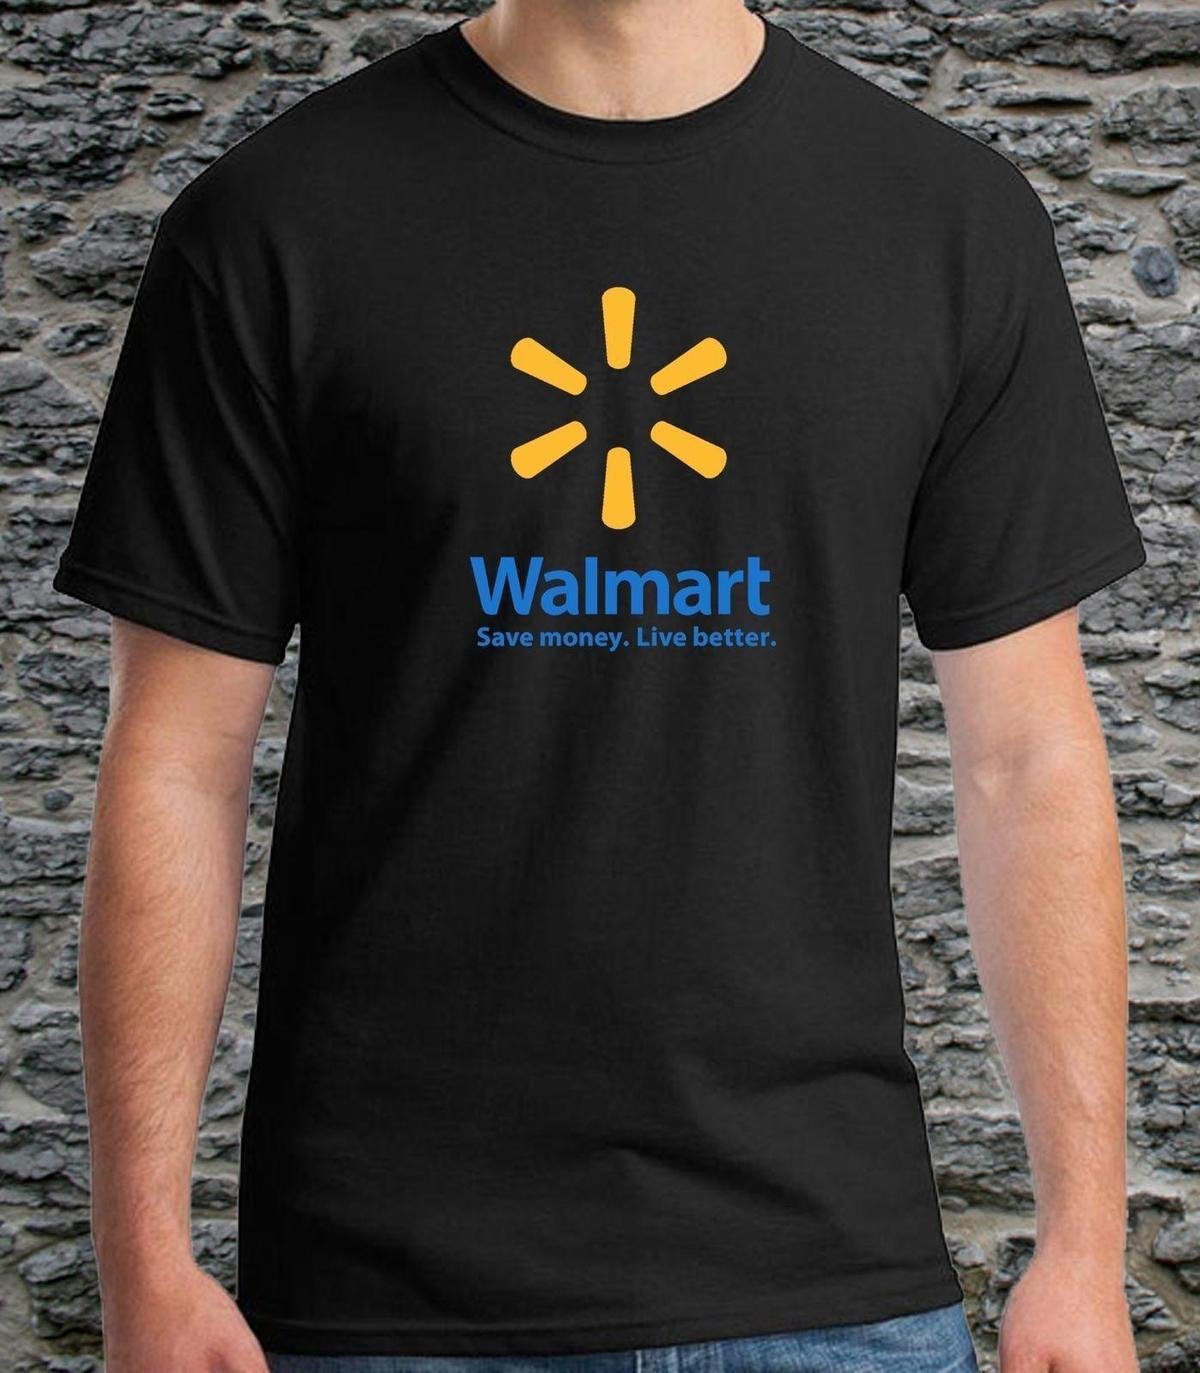 33c5acf4f6b NEW Walmart Market Store Furniture T Shirt Black Men S Size S 3XL ...